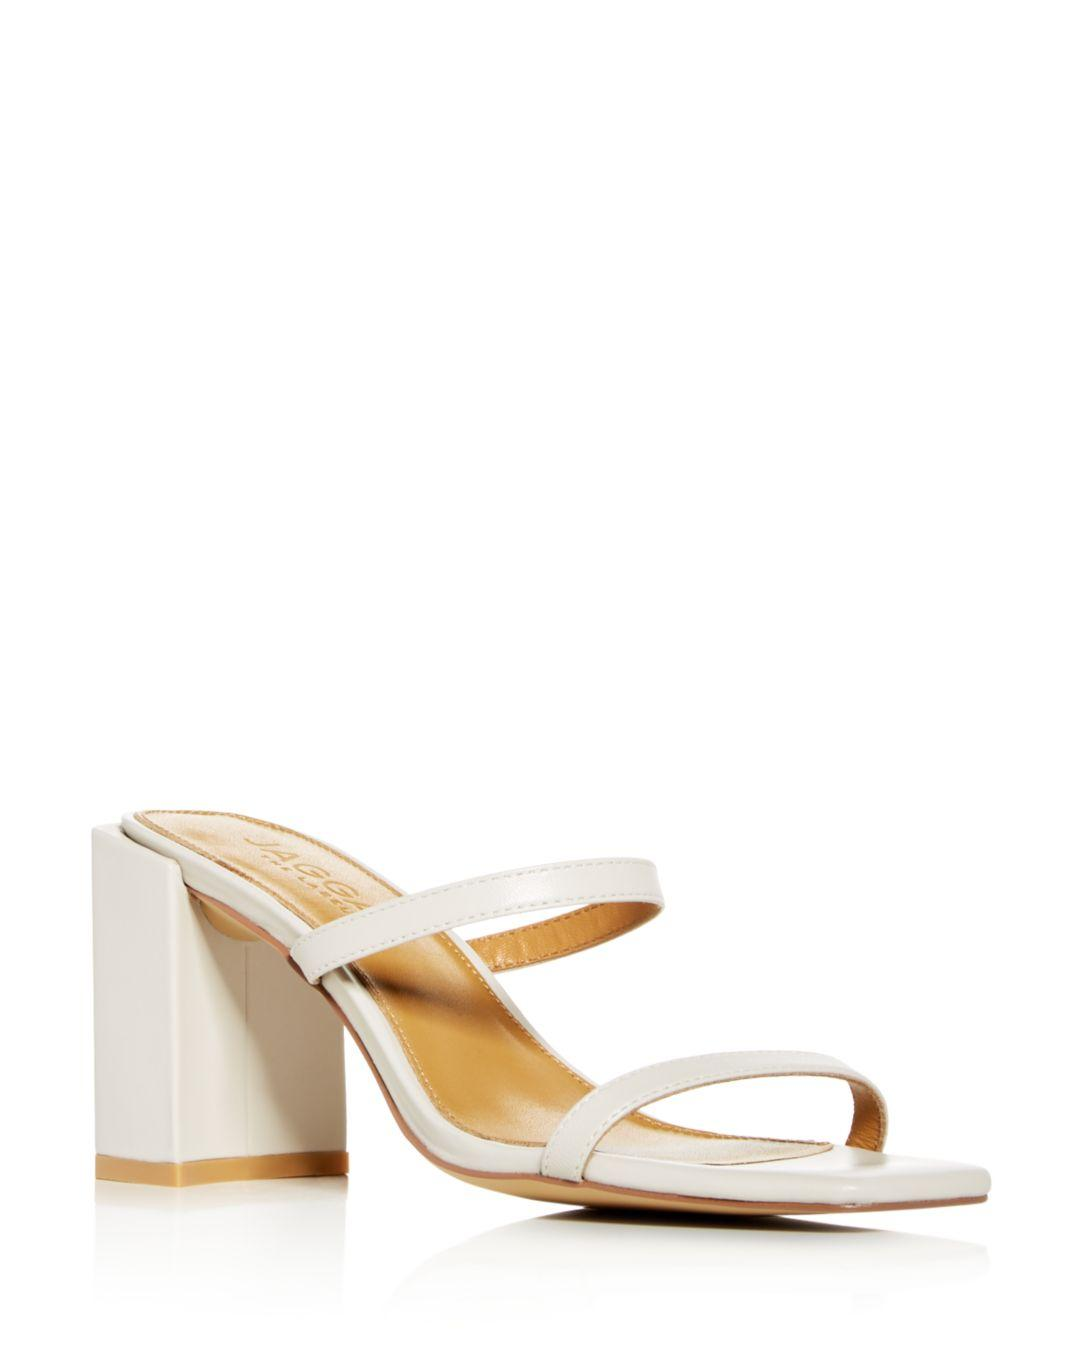 28c58c26a4d Jaggar - Natural Women s Square Block-heel Slide Sandals - Lyst. View  fullscreen